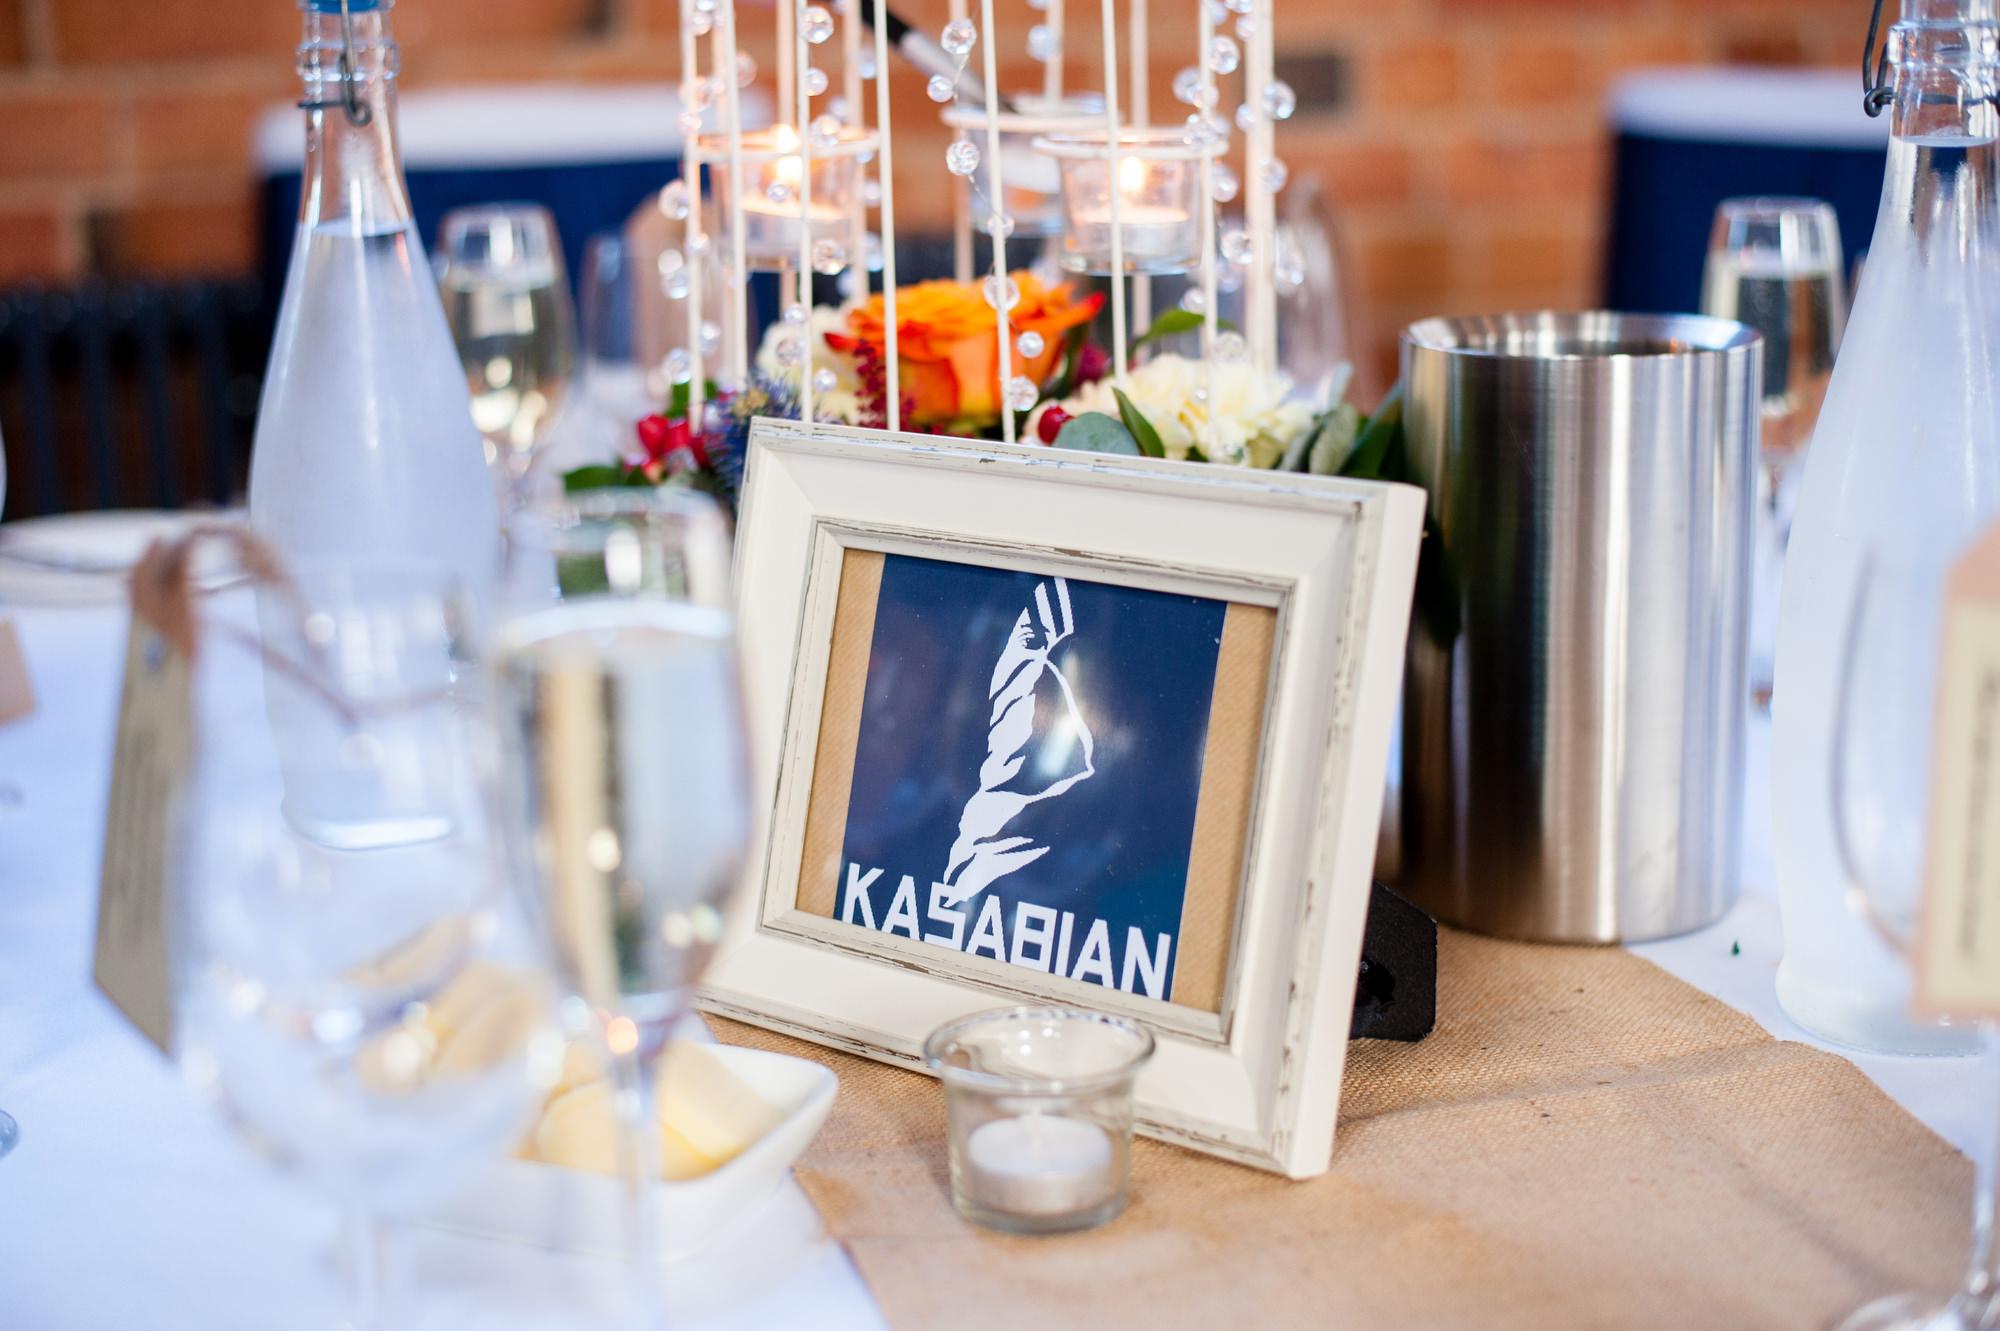 Geoff-Kirby-photography-Carriage-Hall-wedding0081